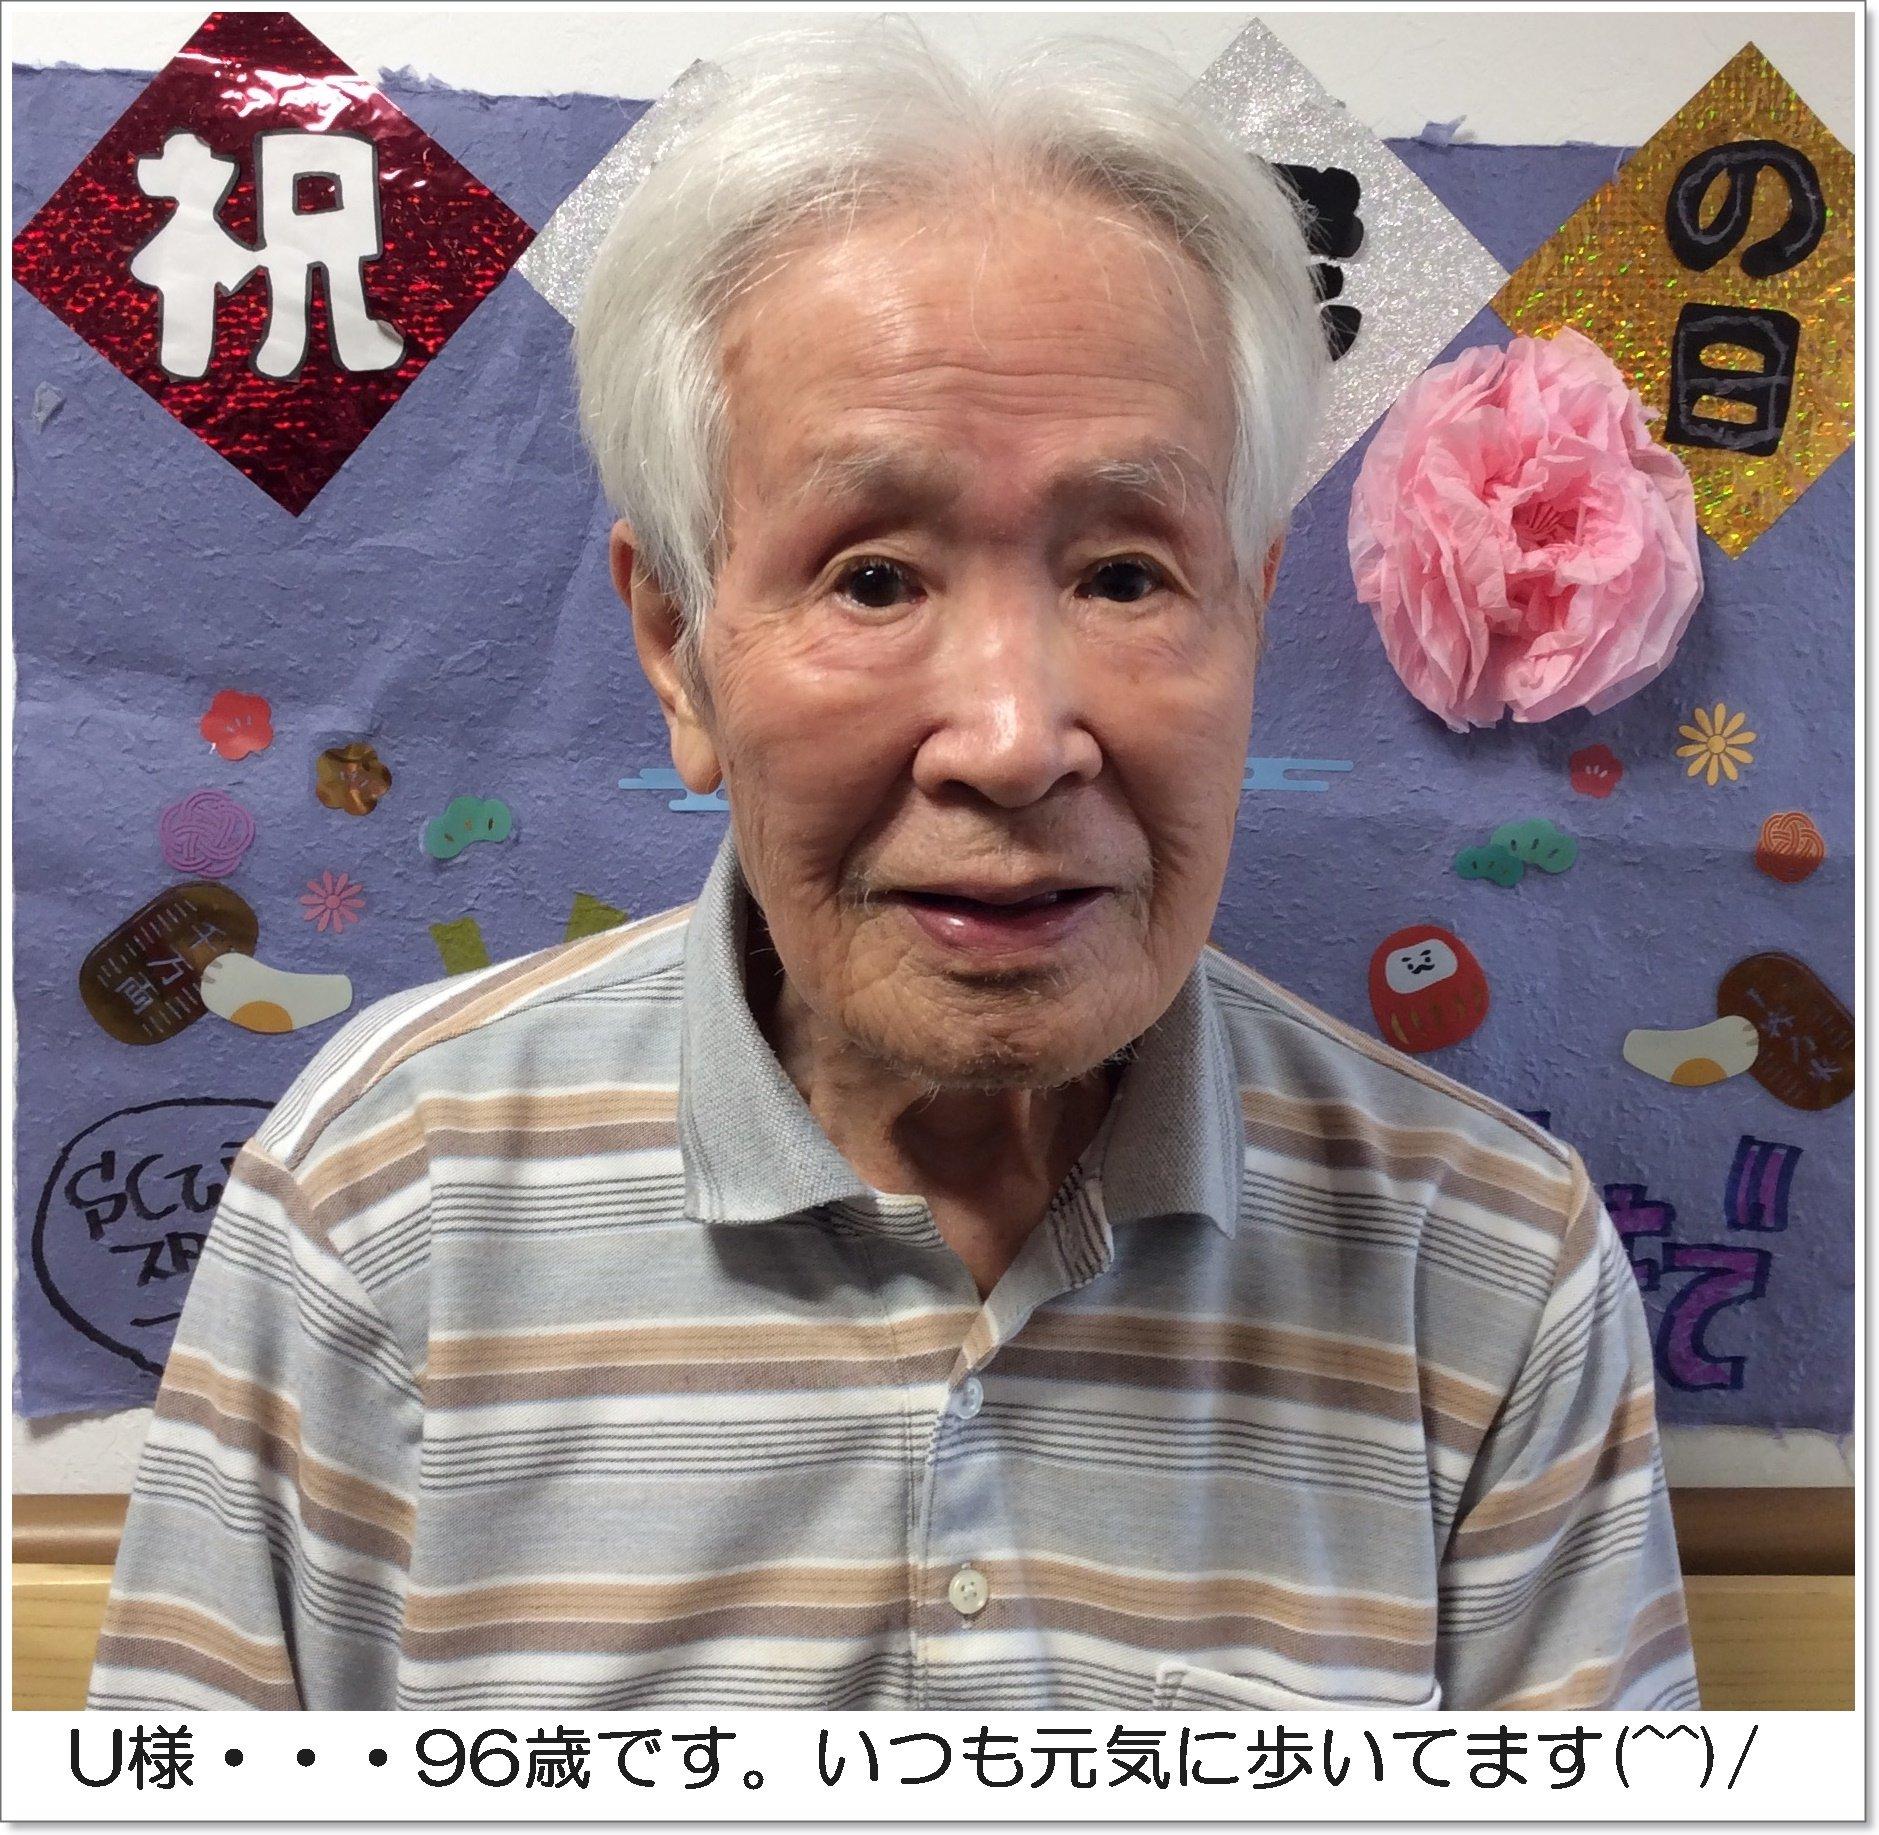 https://www.supercourt.jp/blog/hirano/IMG_2631-crop.JPG